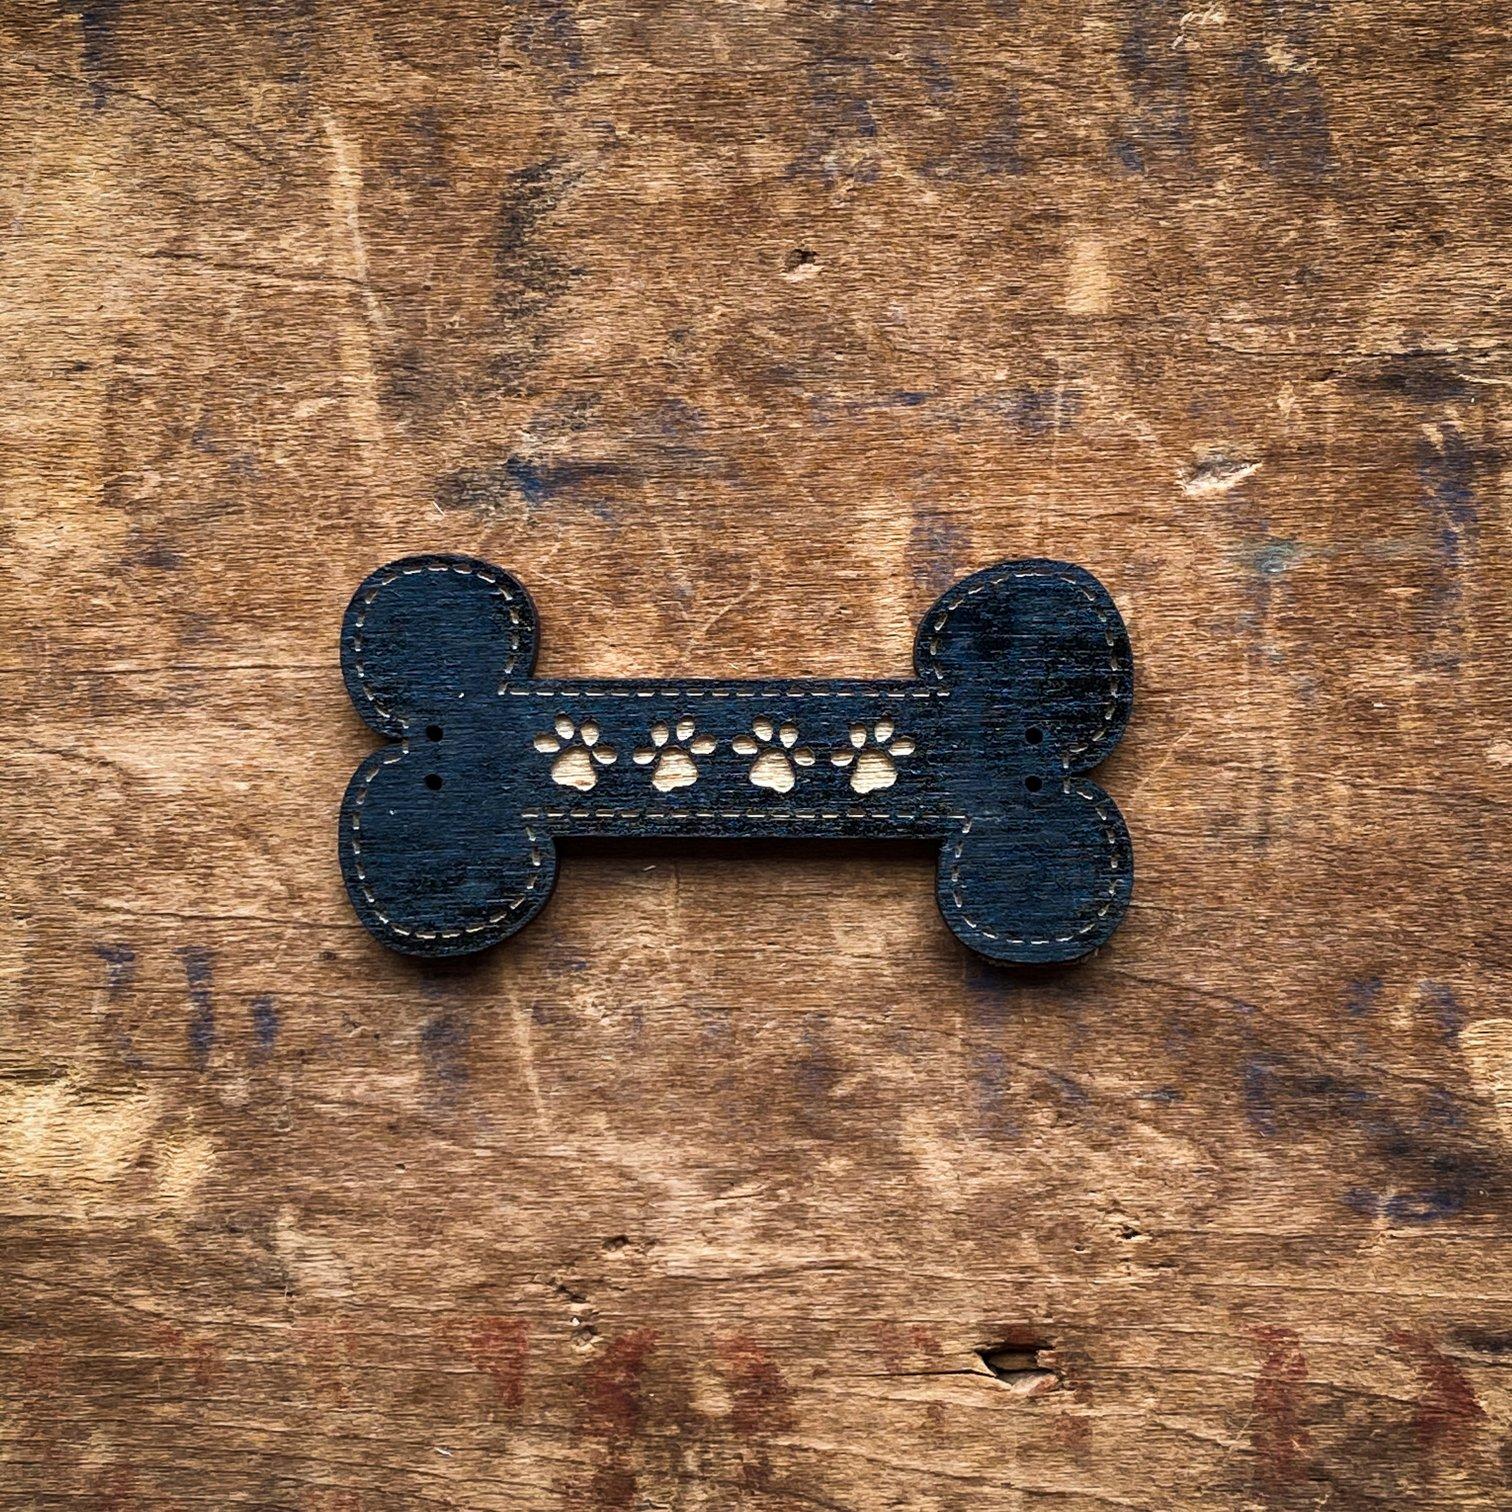 Pawprint Bone Buttons